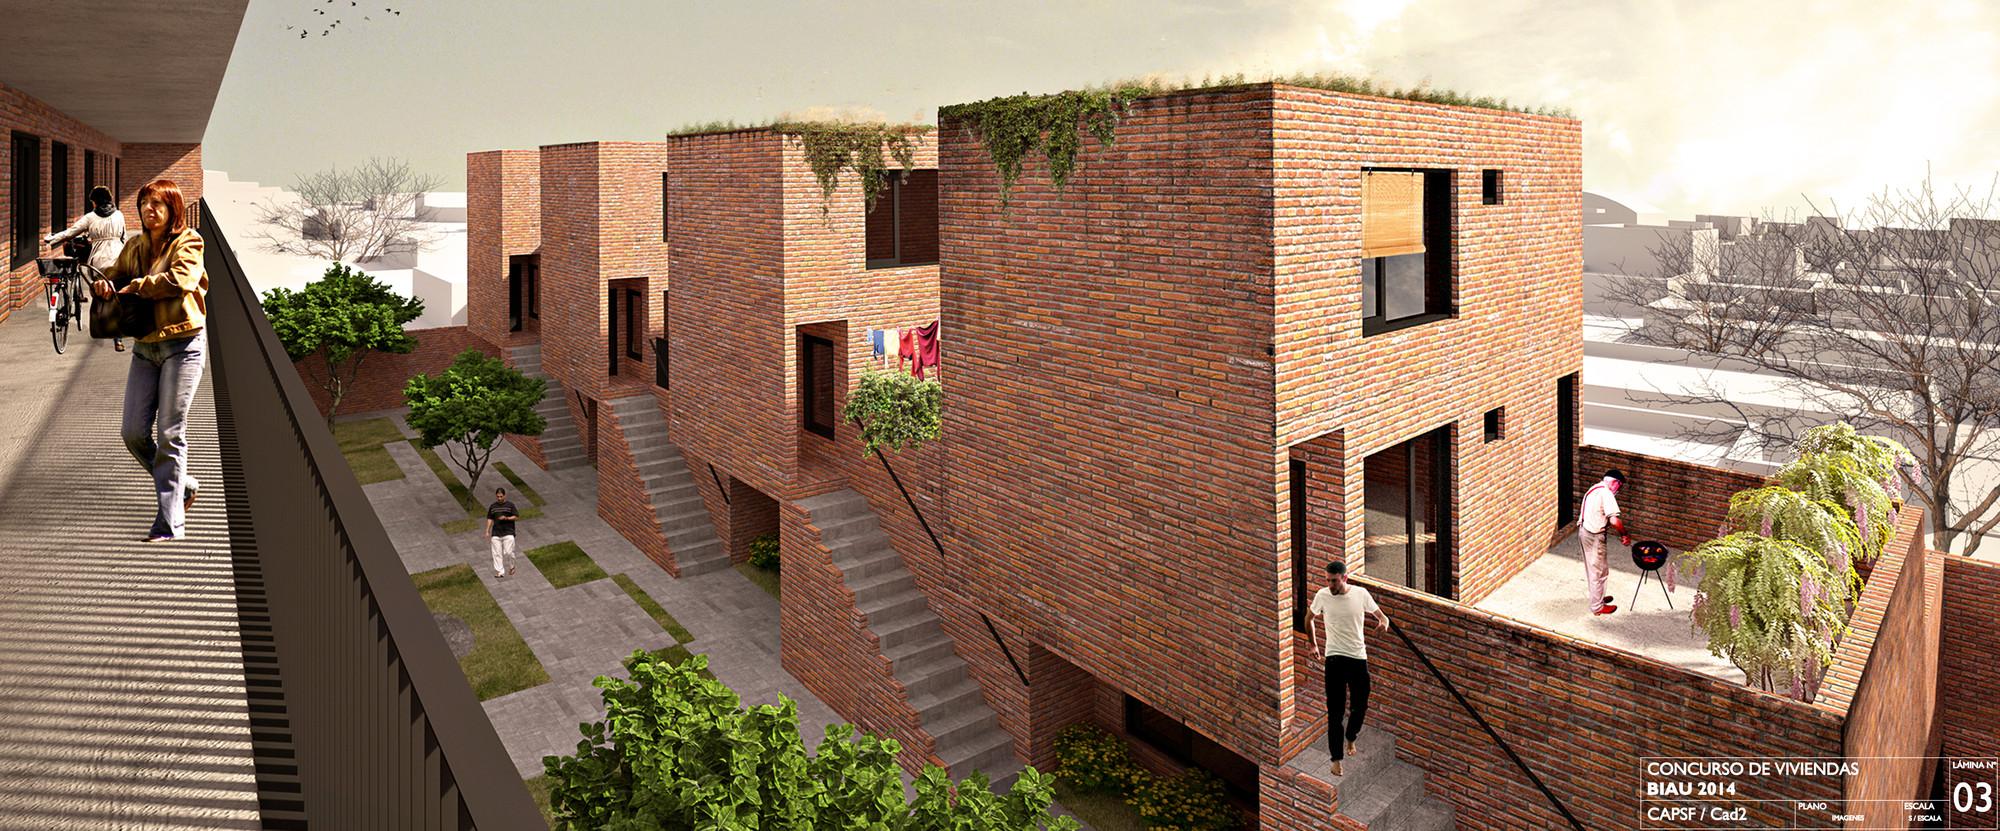 Segundo lugar en concurso iberoamericano de vivienda for Plataforma arquitectura